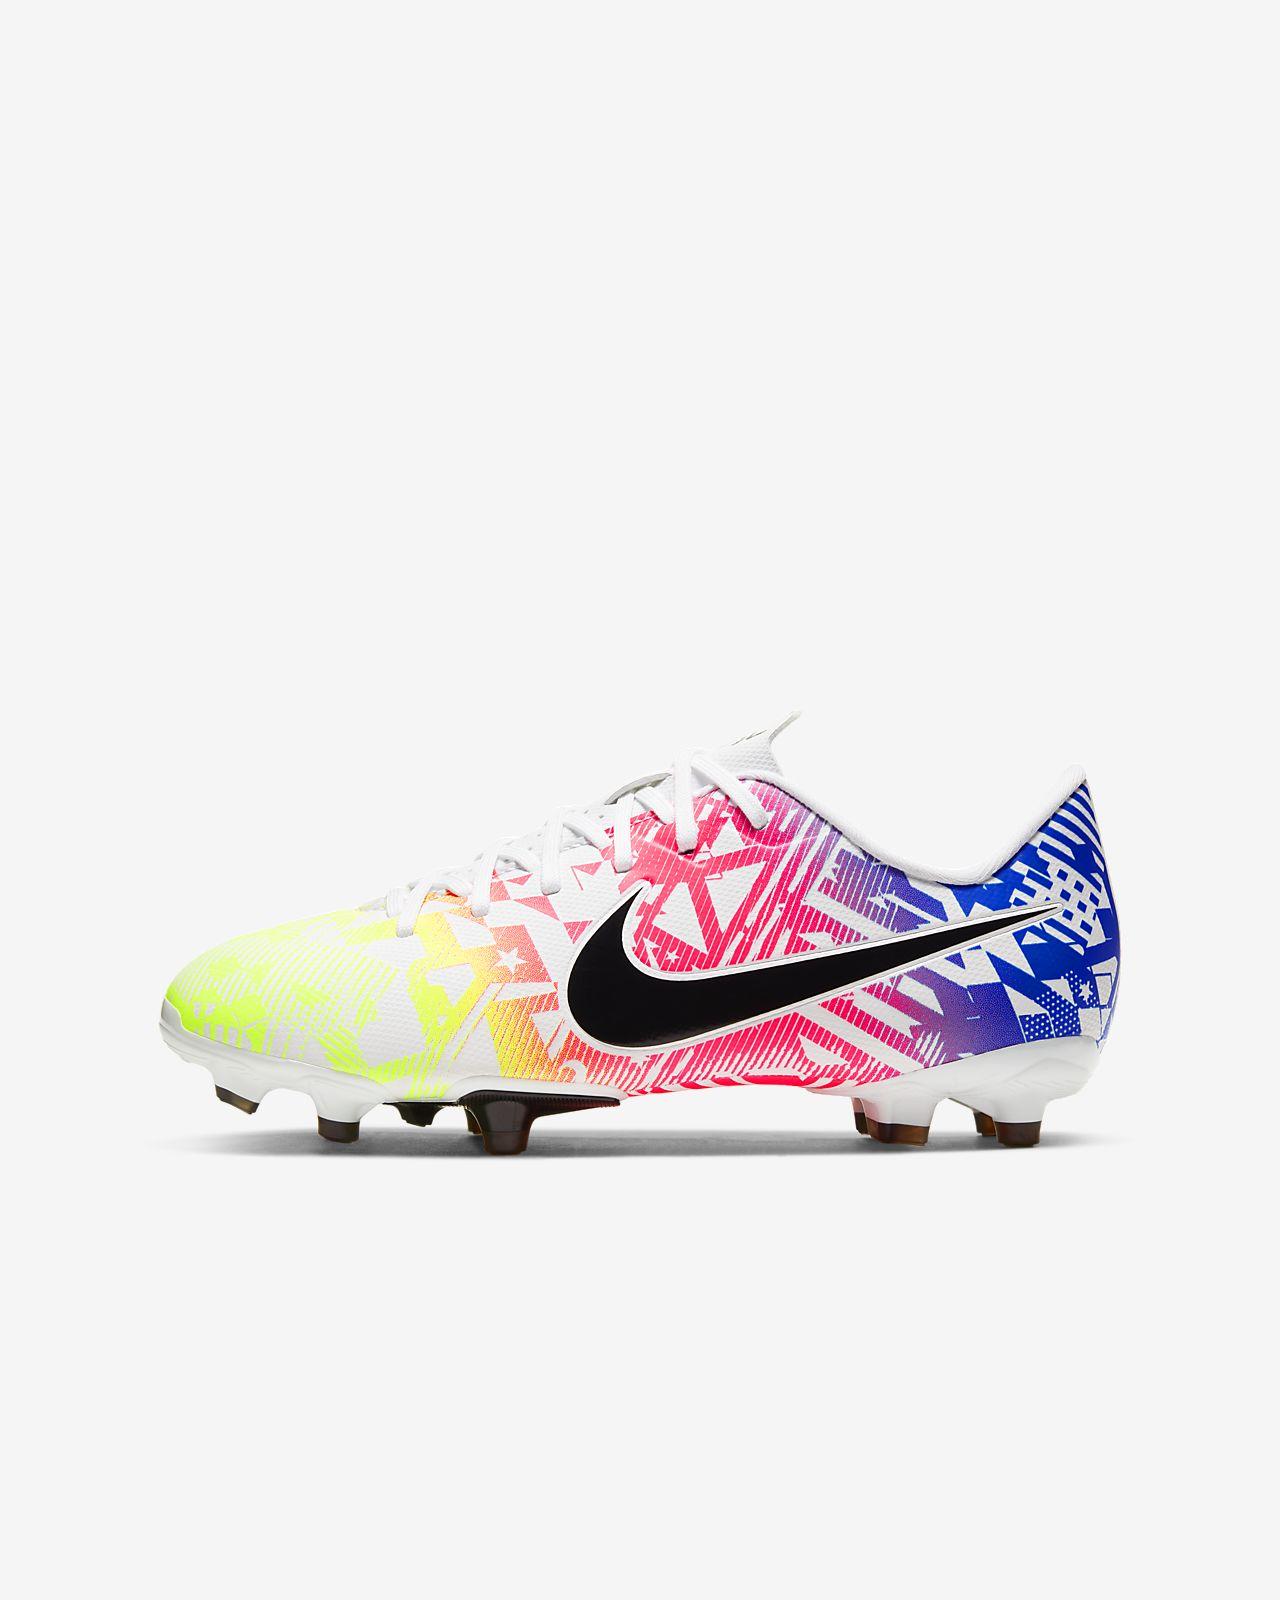 Nike Jr. Mercurial Vapor 13 Academy Neymar Jr. MG Kids' Multi-Ground Football Boot